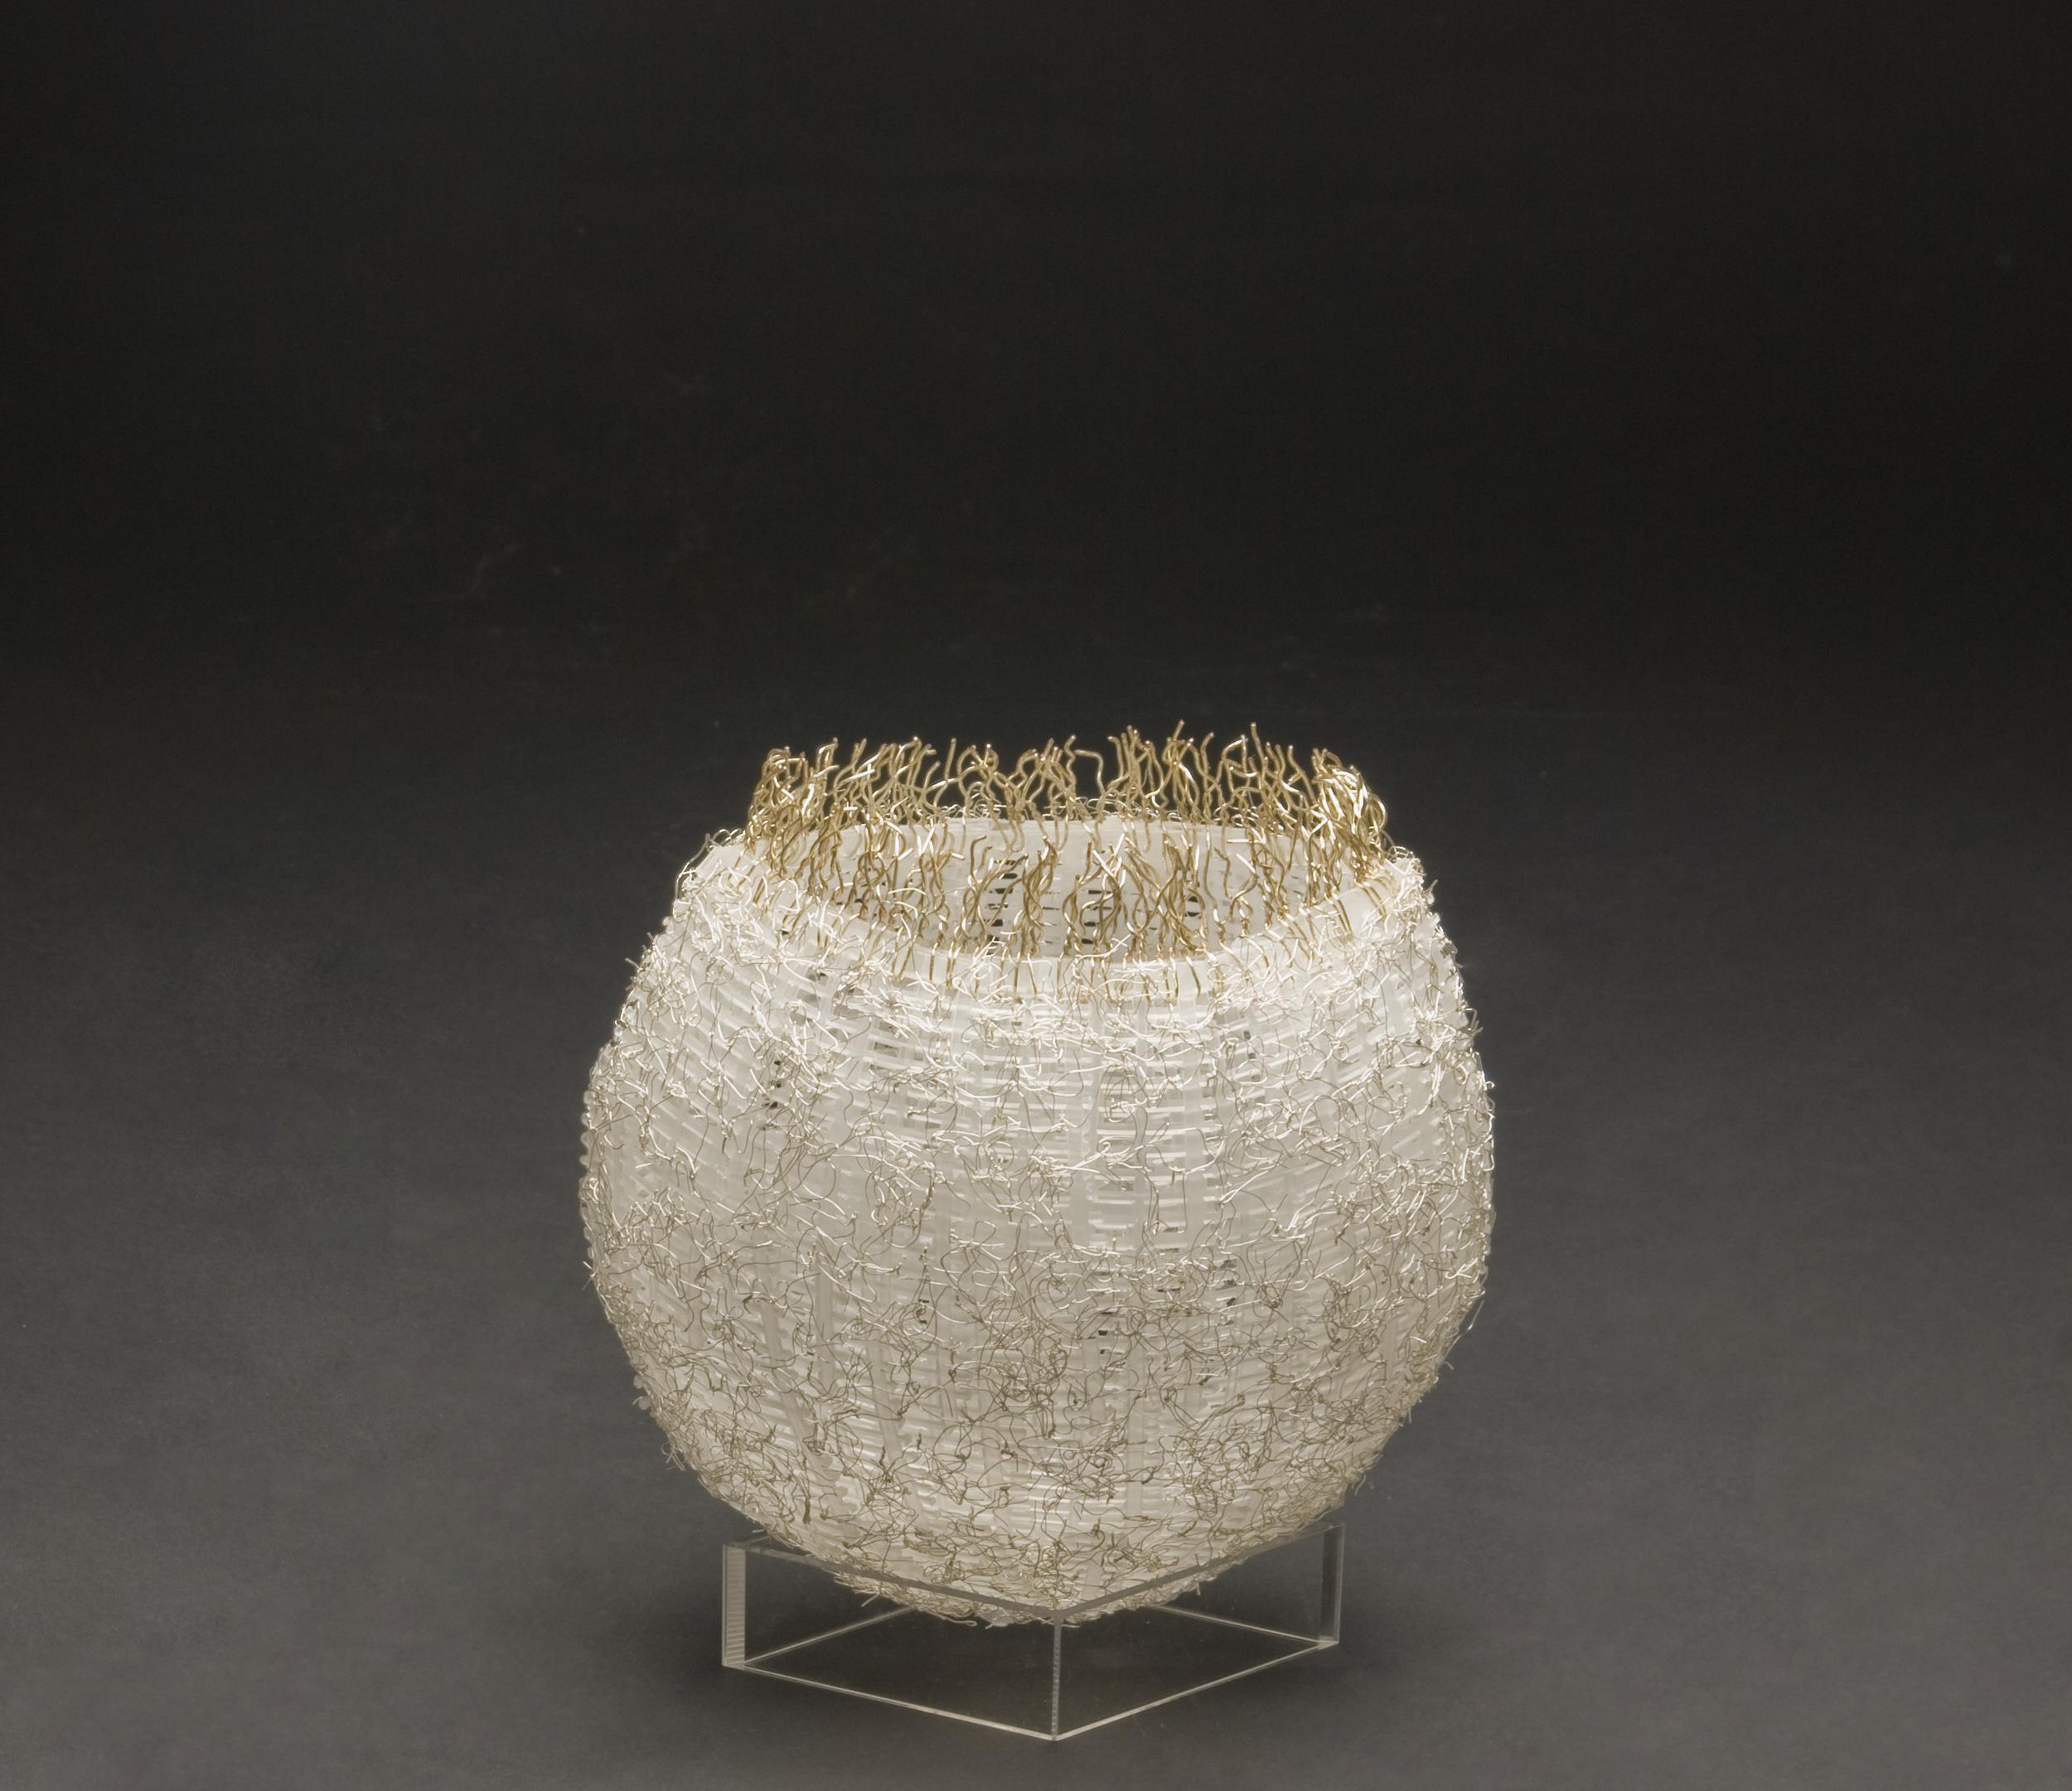 Akiko Mio    Kagokarakagoka  , 2009 Plastic, wire 9.84 x 9.84 x 3.94 inches / 25 x 25 x 10 cm / AkM 1